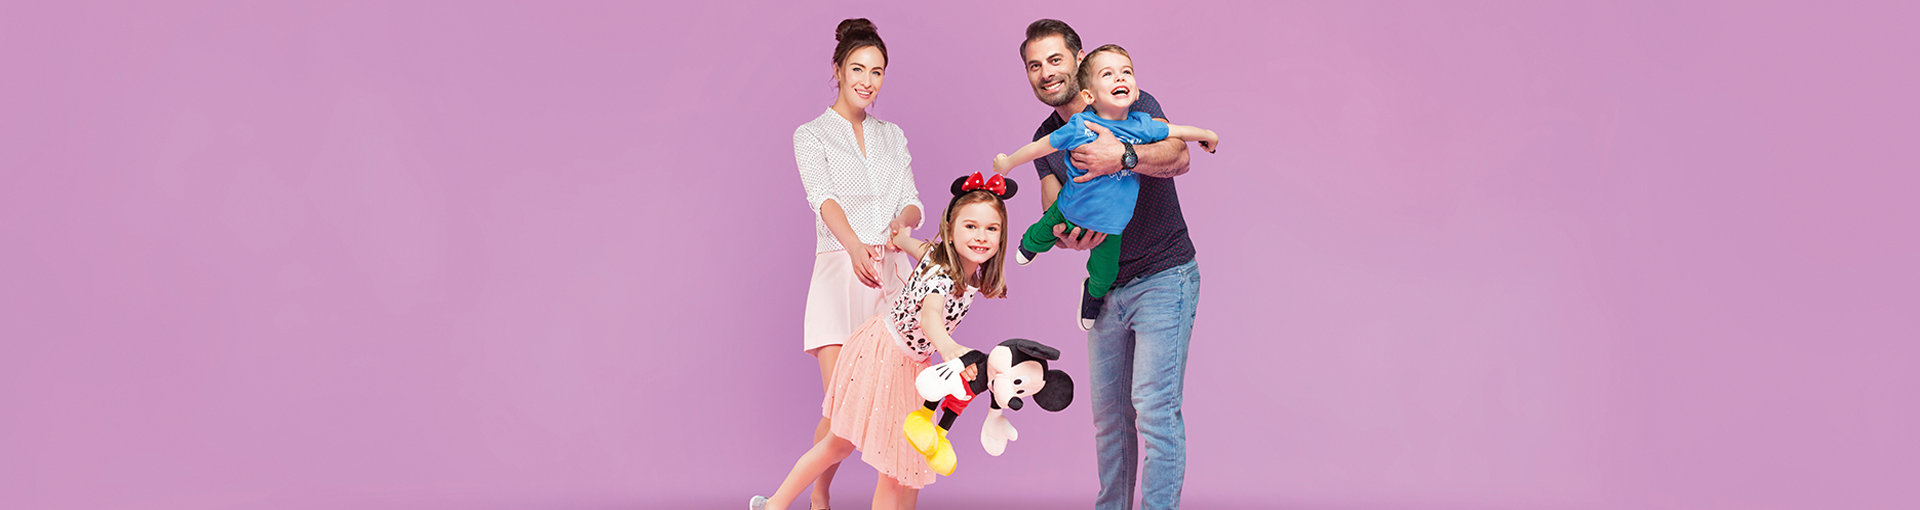 Delia, Raul, Emma & Eric spring 2017 VIVO campaign